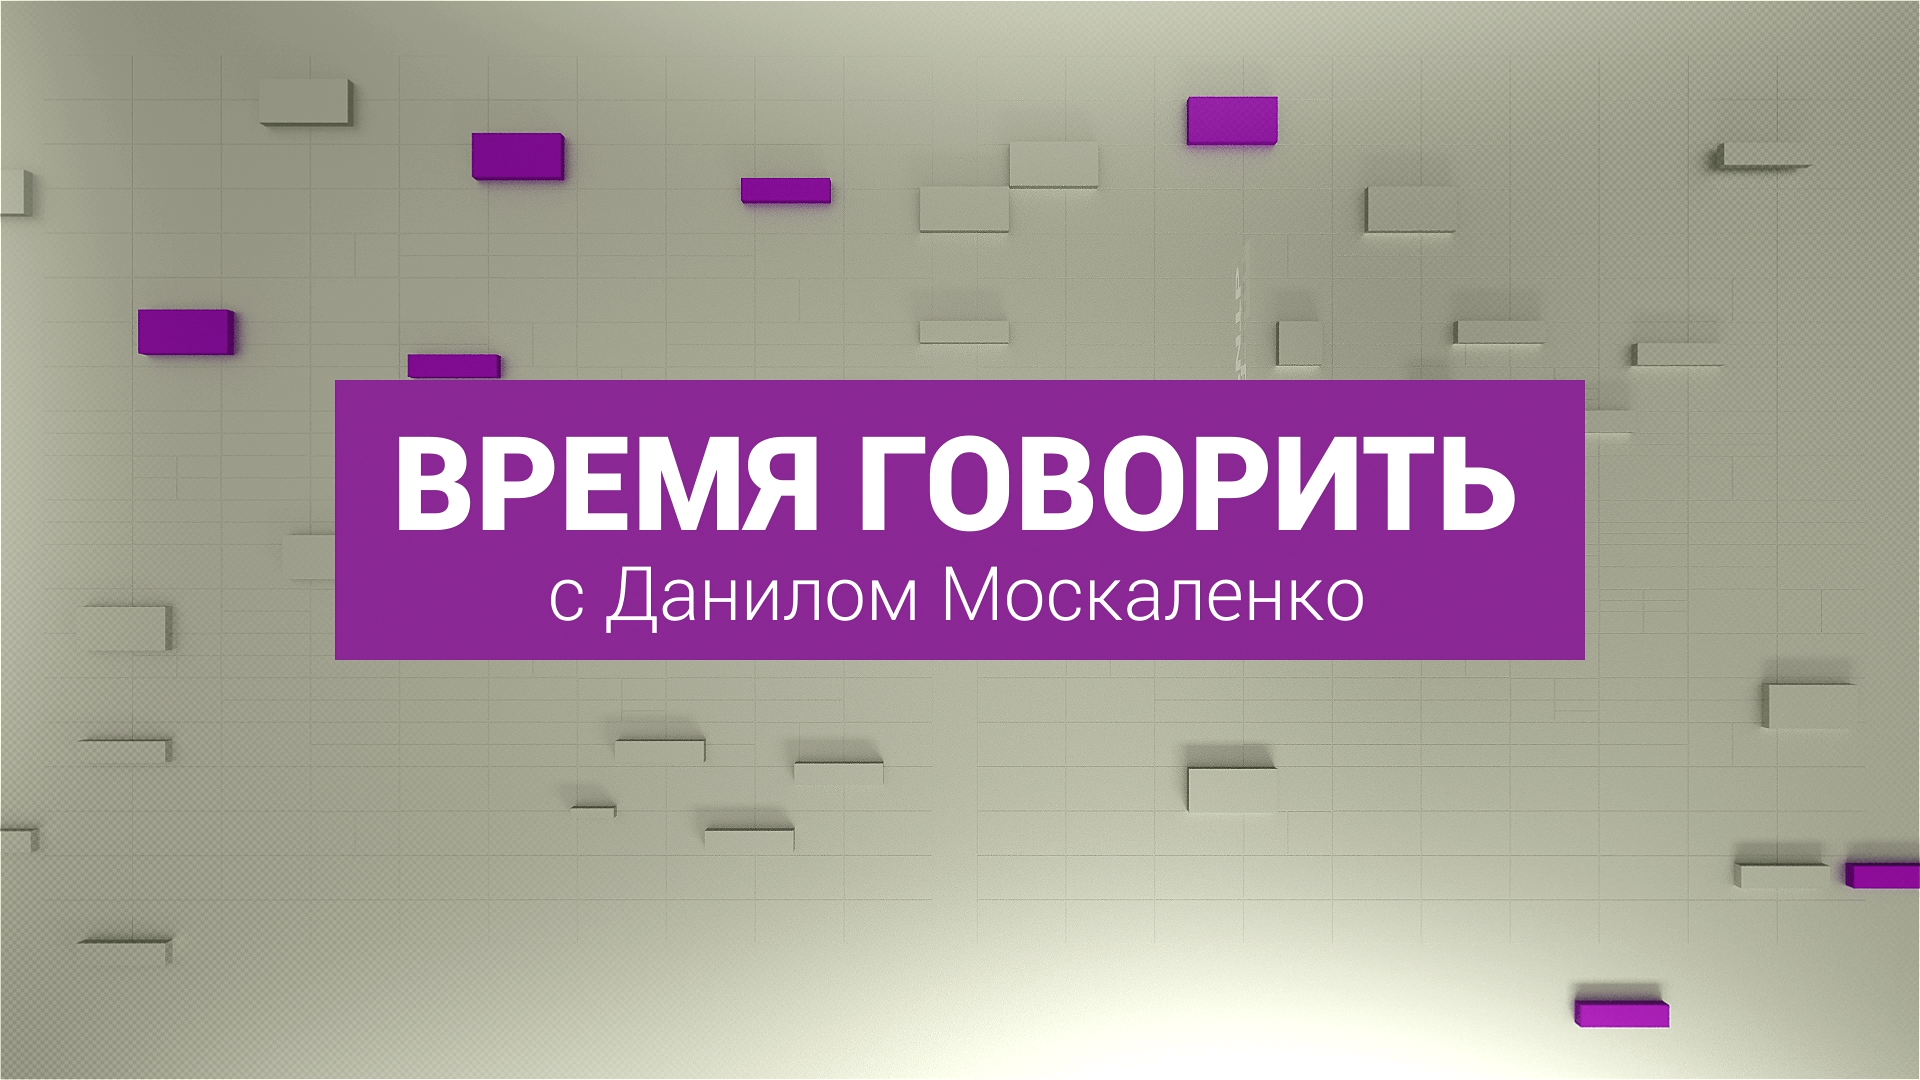 https://inbusiness.kz/ru/images/programbig/9/images/pZOFoTsg.png